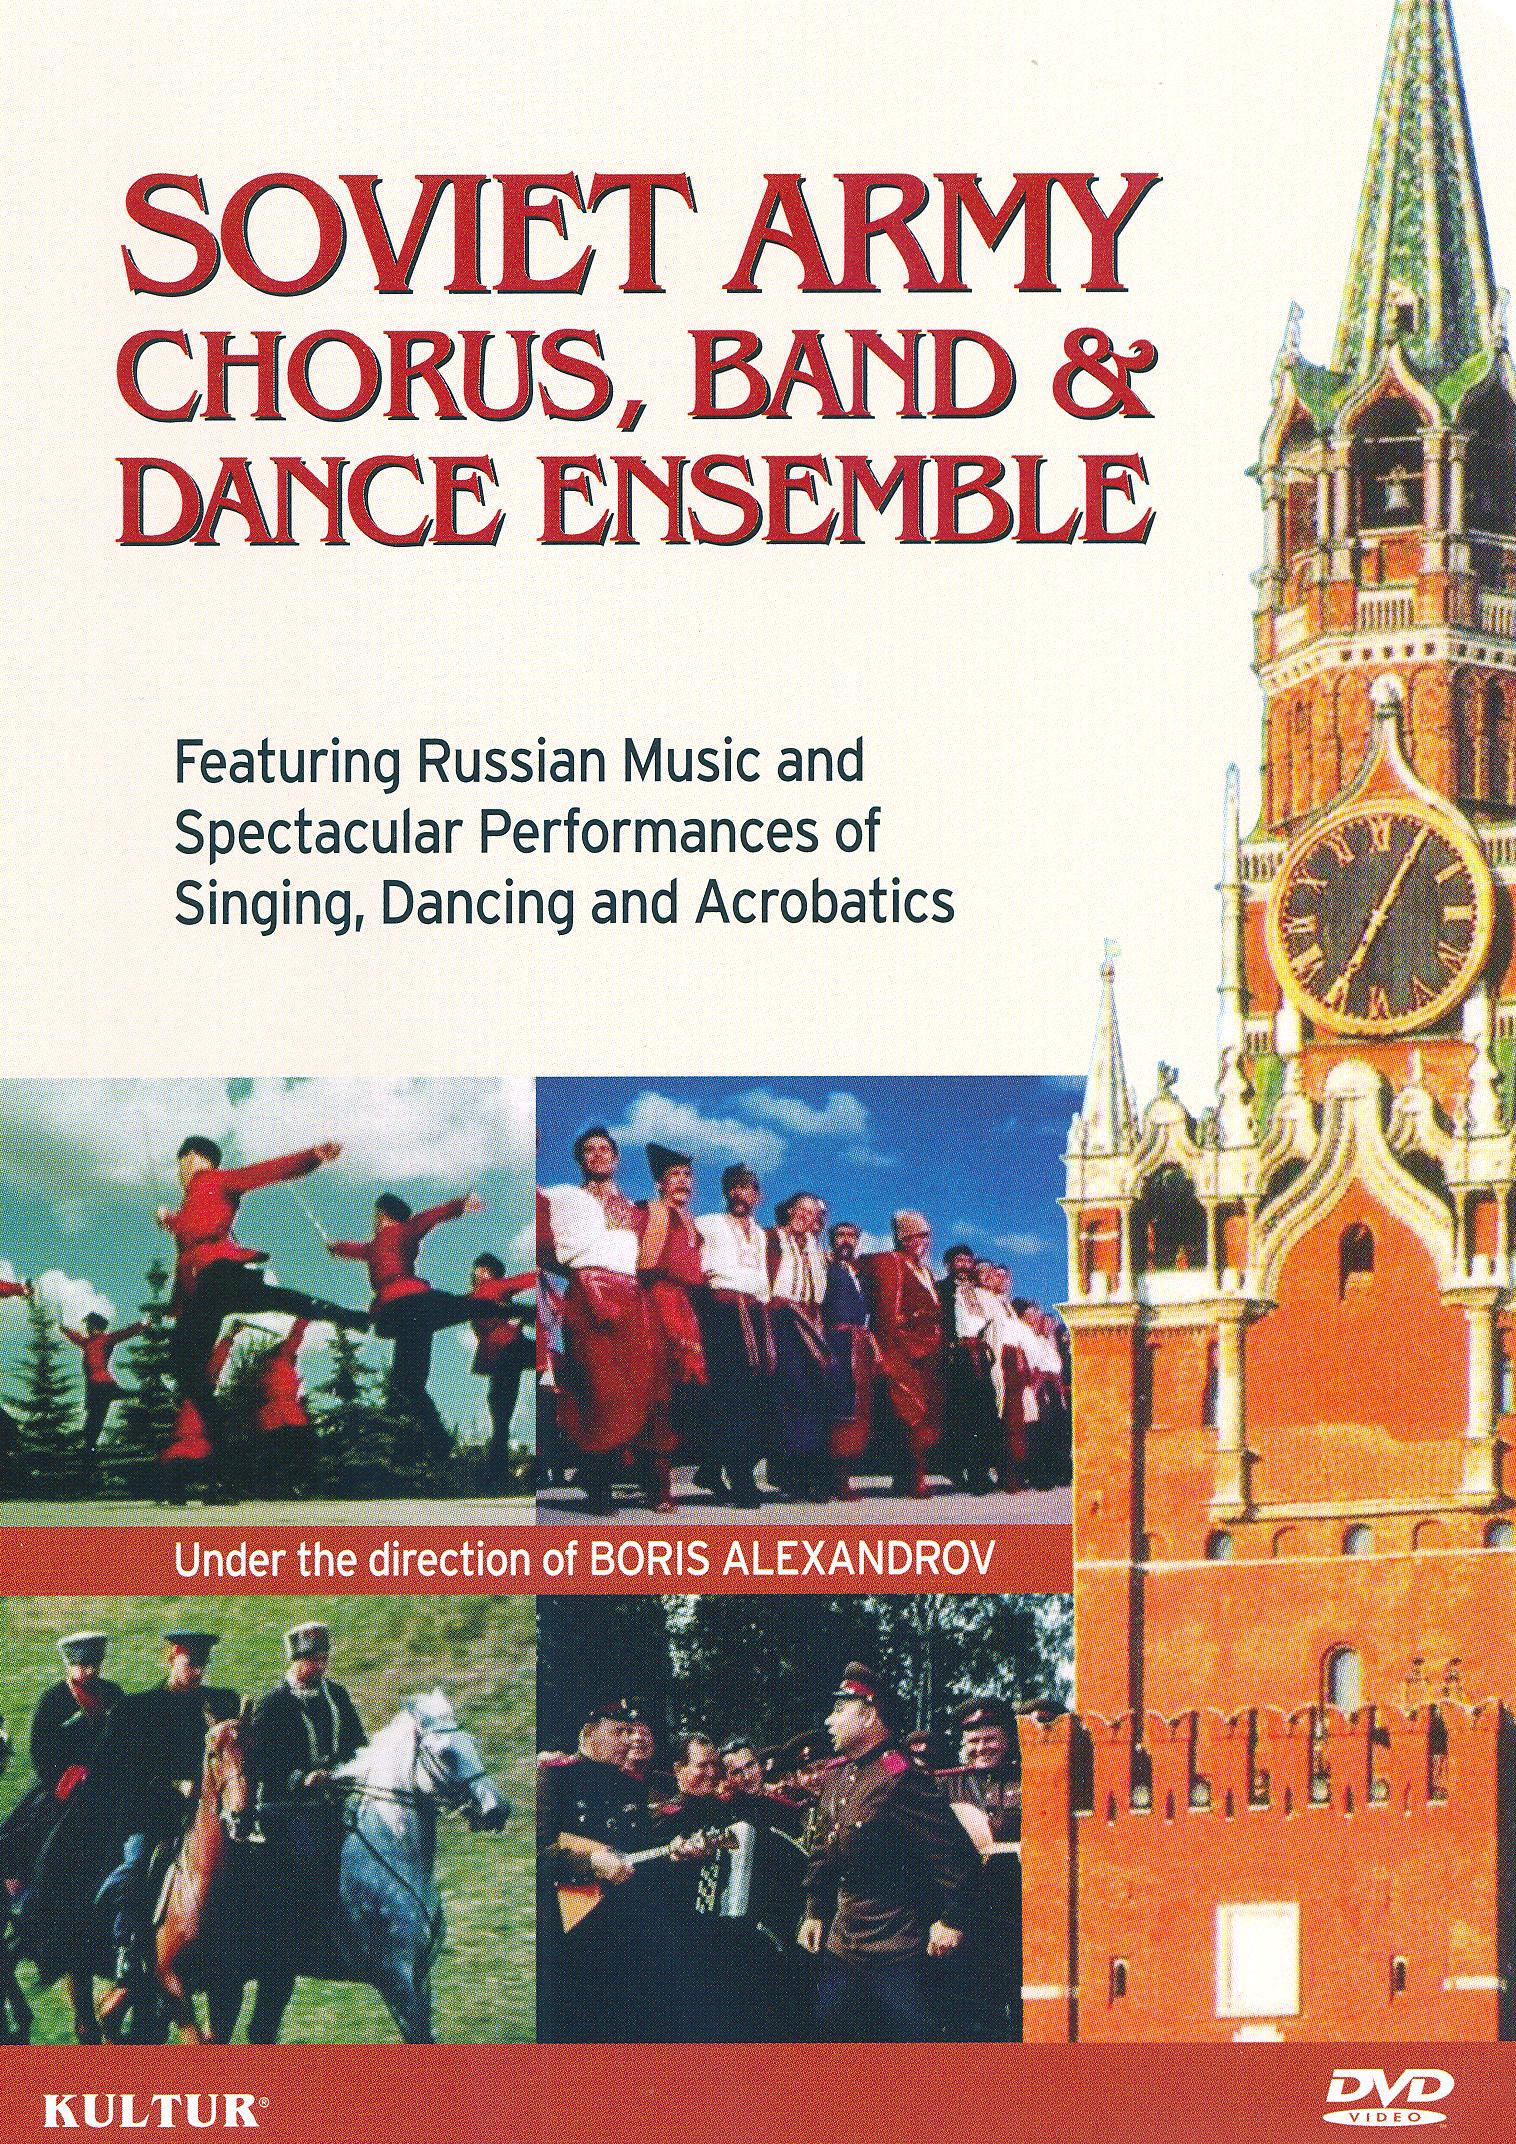 Soviet Army Chorus, Band, and Dance Ensemble